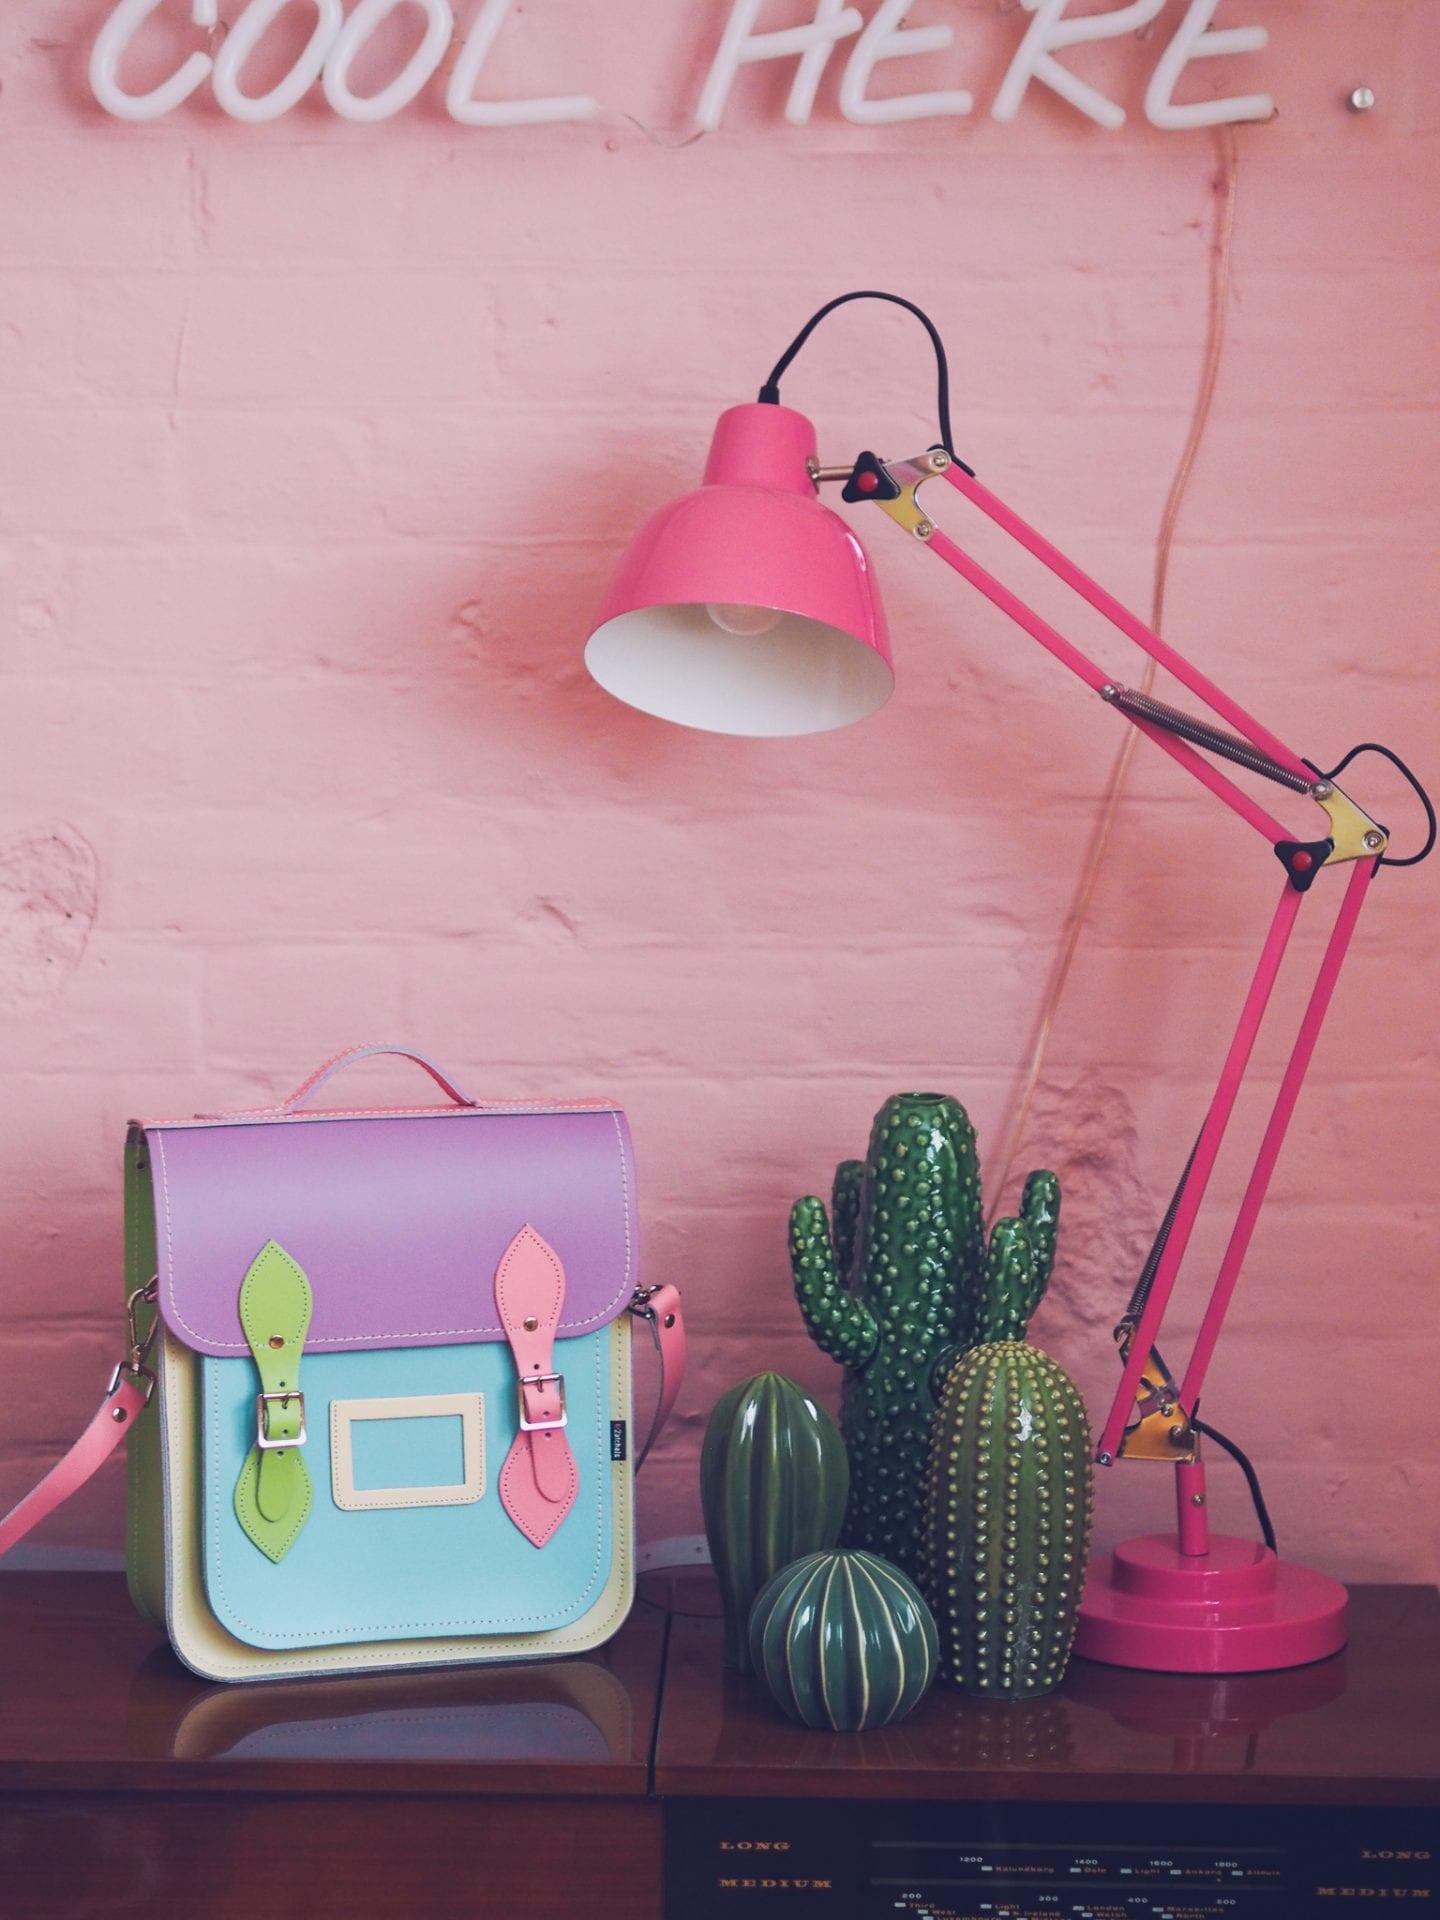 zatchels multicoloured backpack satchel bag handbag review rainbow